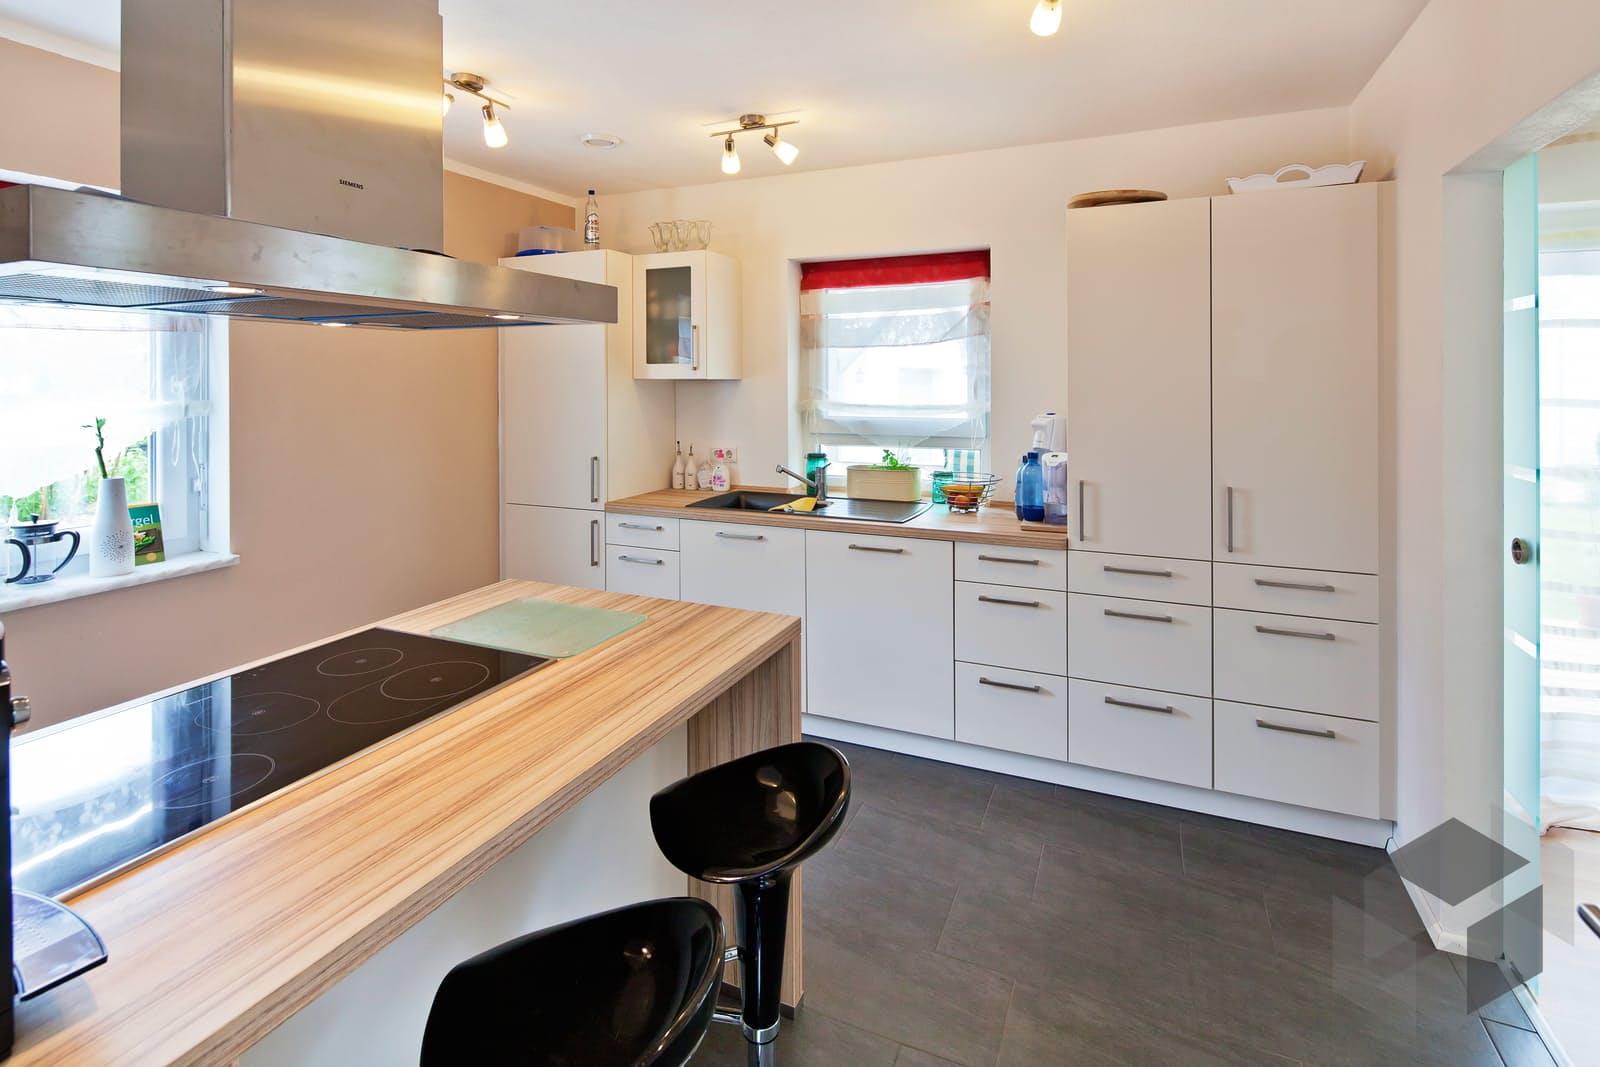 edition 21 plus satteldach klassik von luxhaus komplette. Black Bedroom Furniture Sets. Home Design Ideas